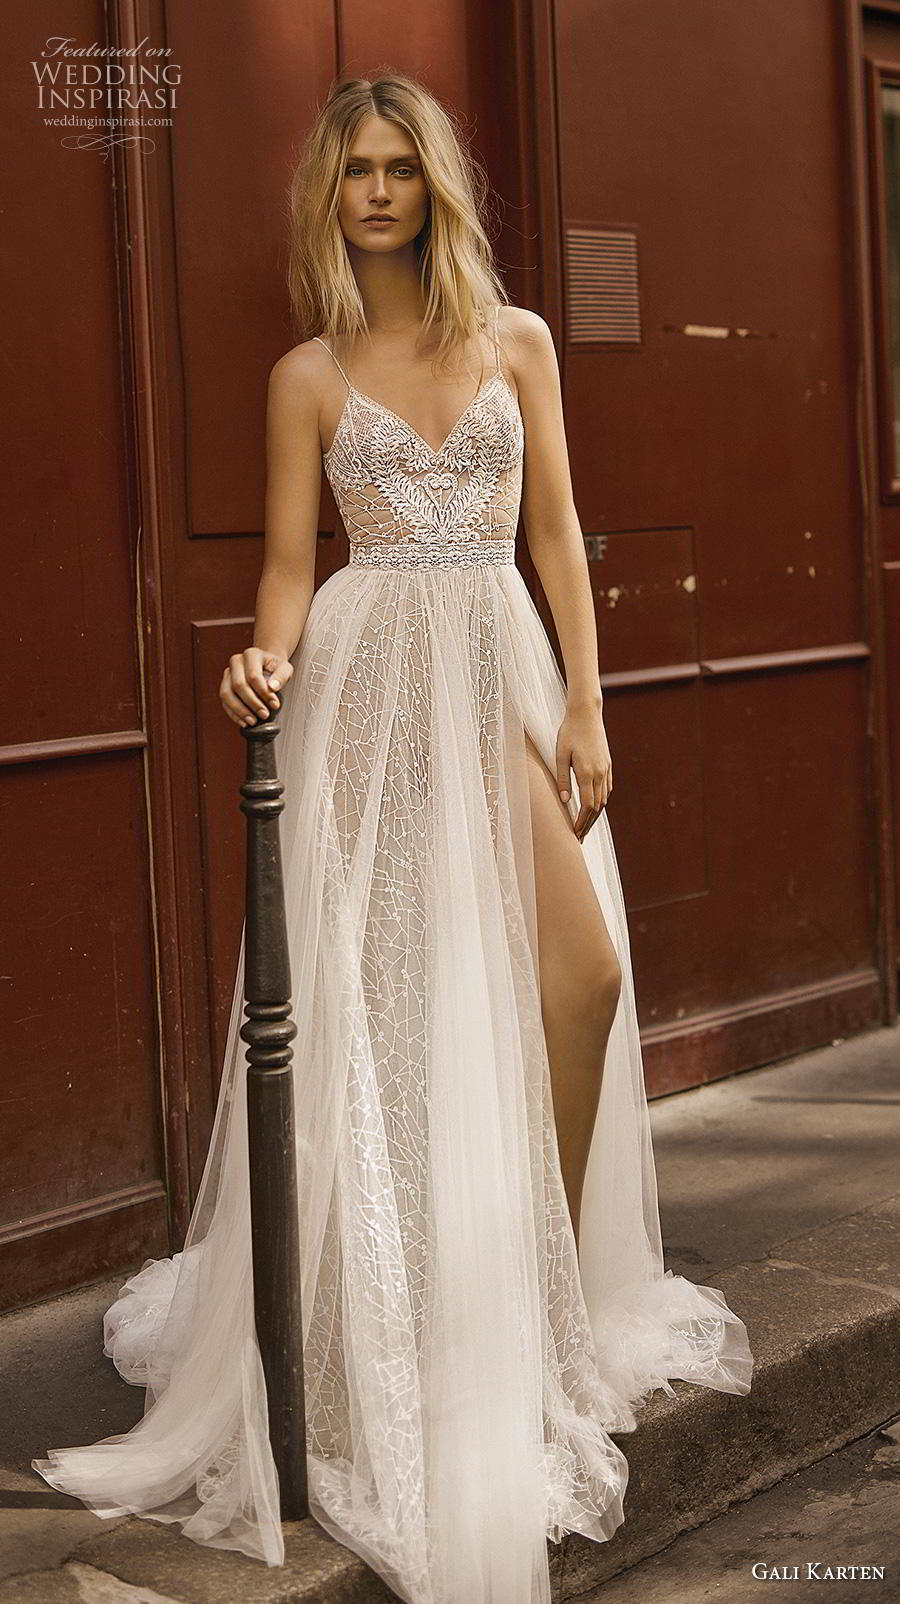 c520352db3b0 gali karten 2019 bridal sleeveless spaghetti strap diamond neckline heavily  embellished bodice slit skirt romantic soft